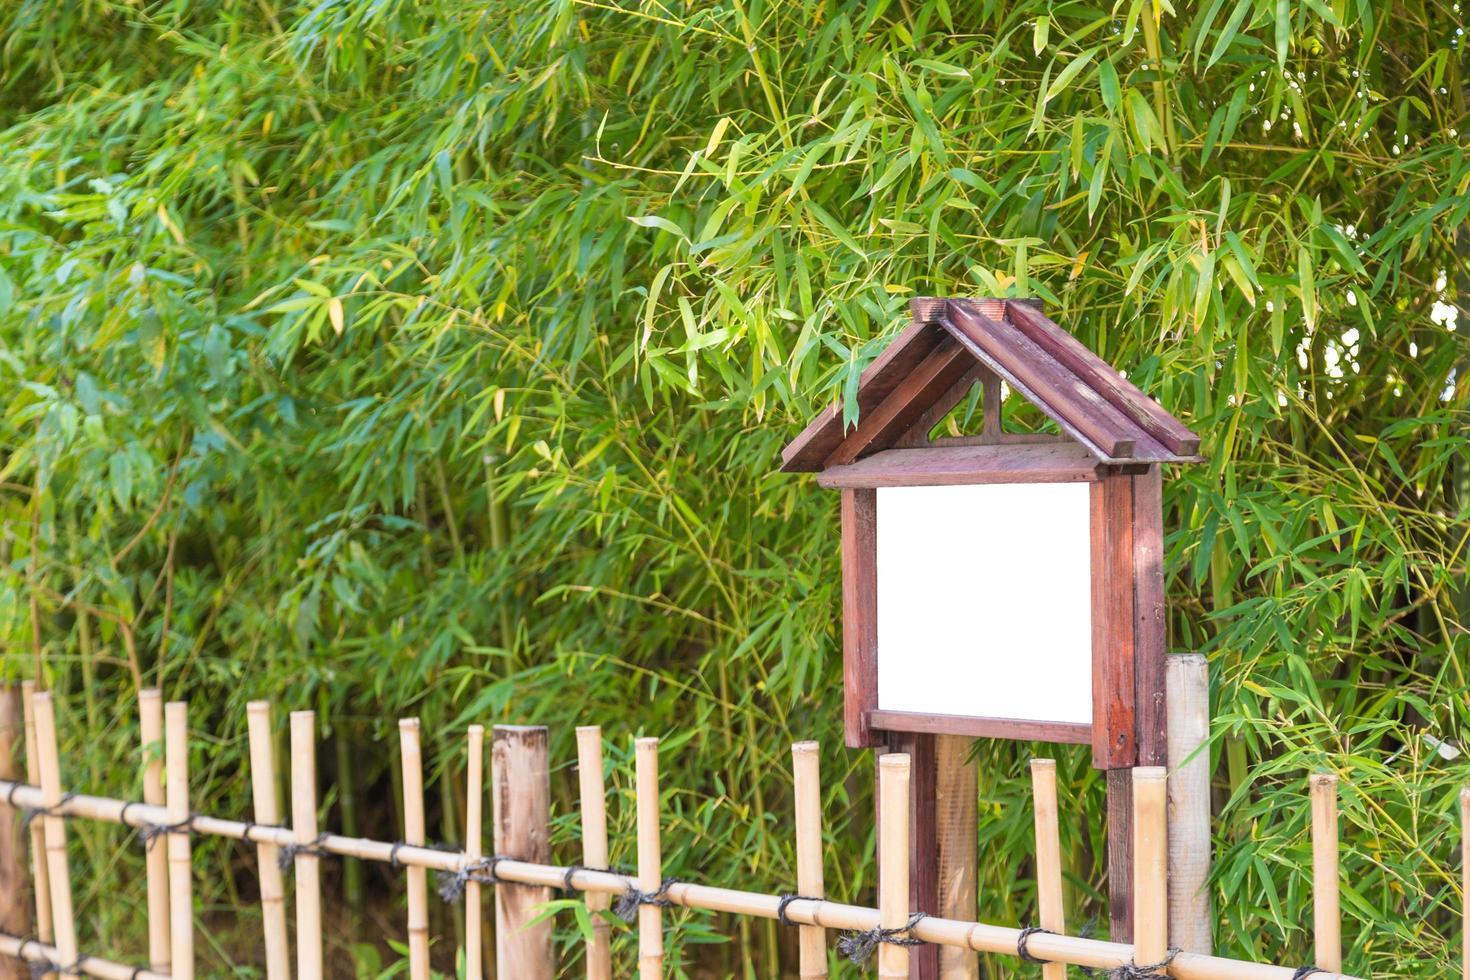 valla de bambú frente a los árboles de bambú foto